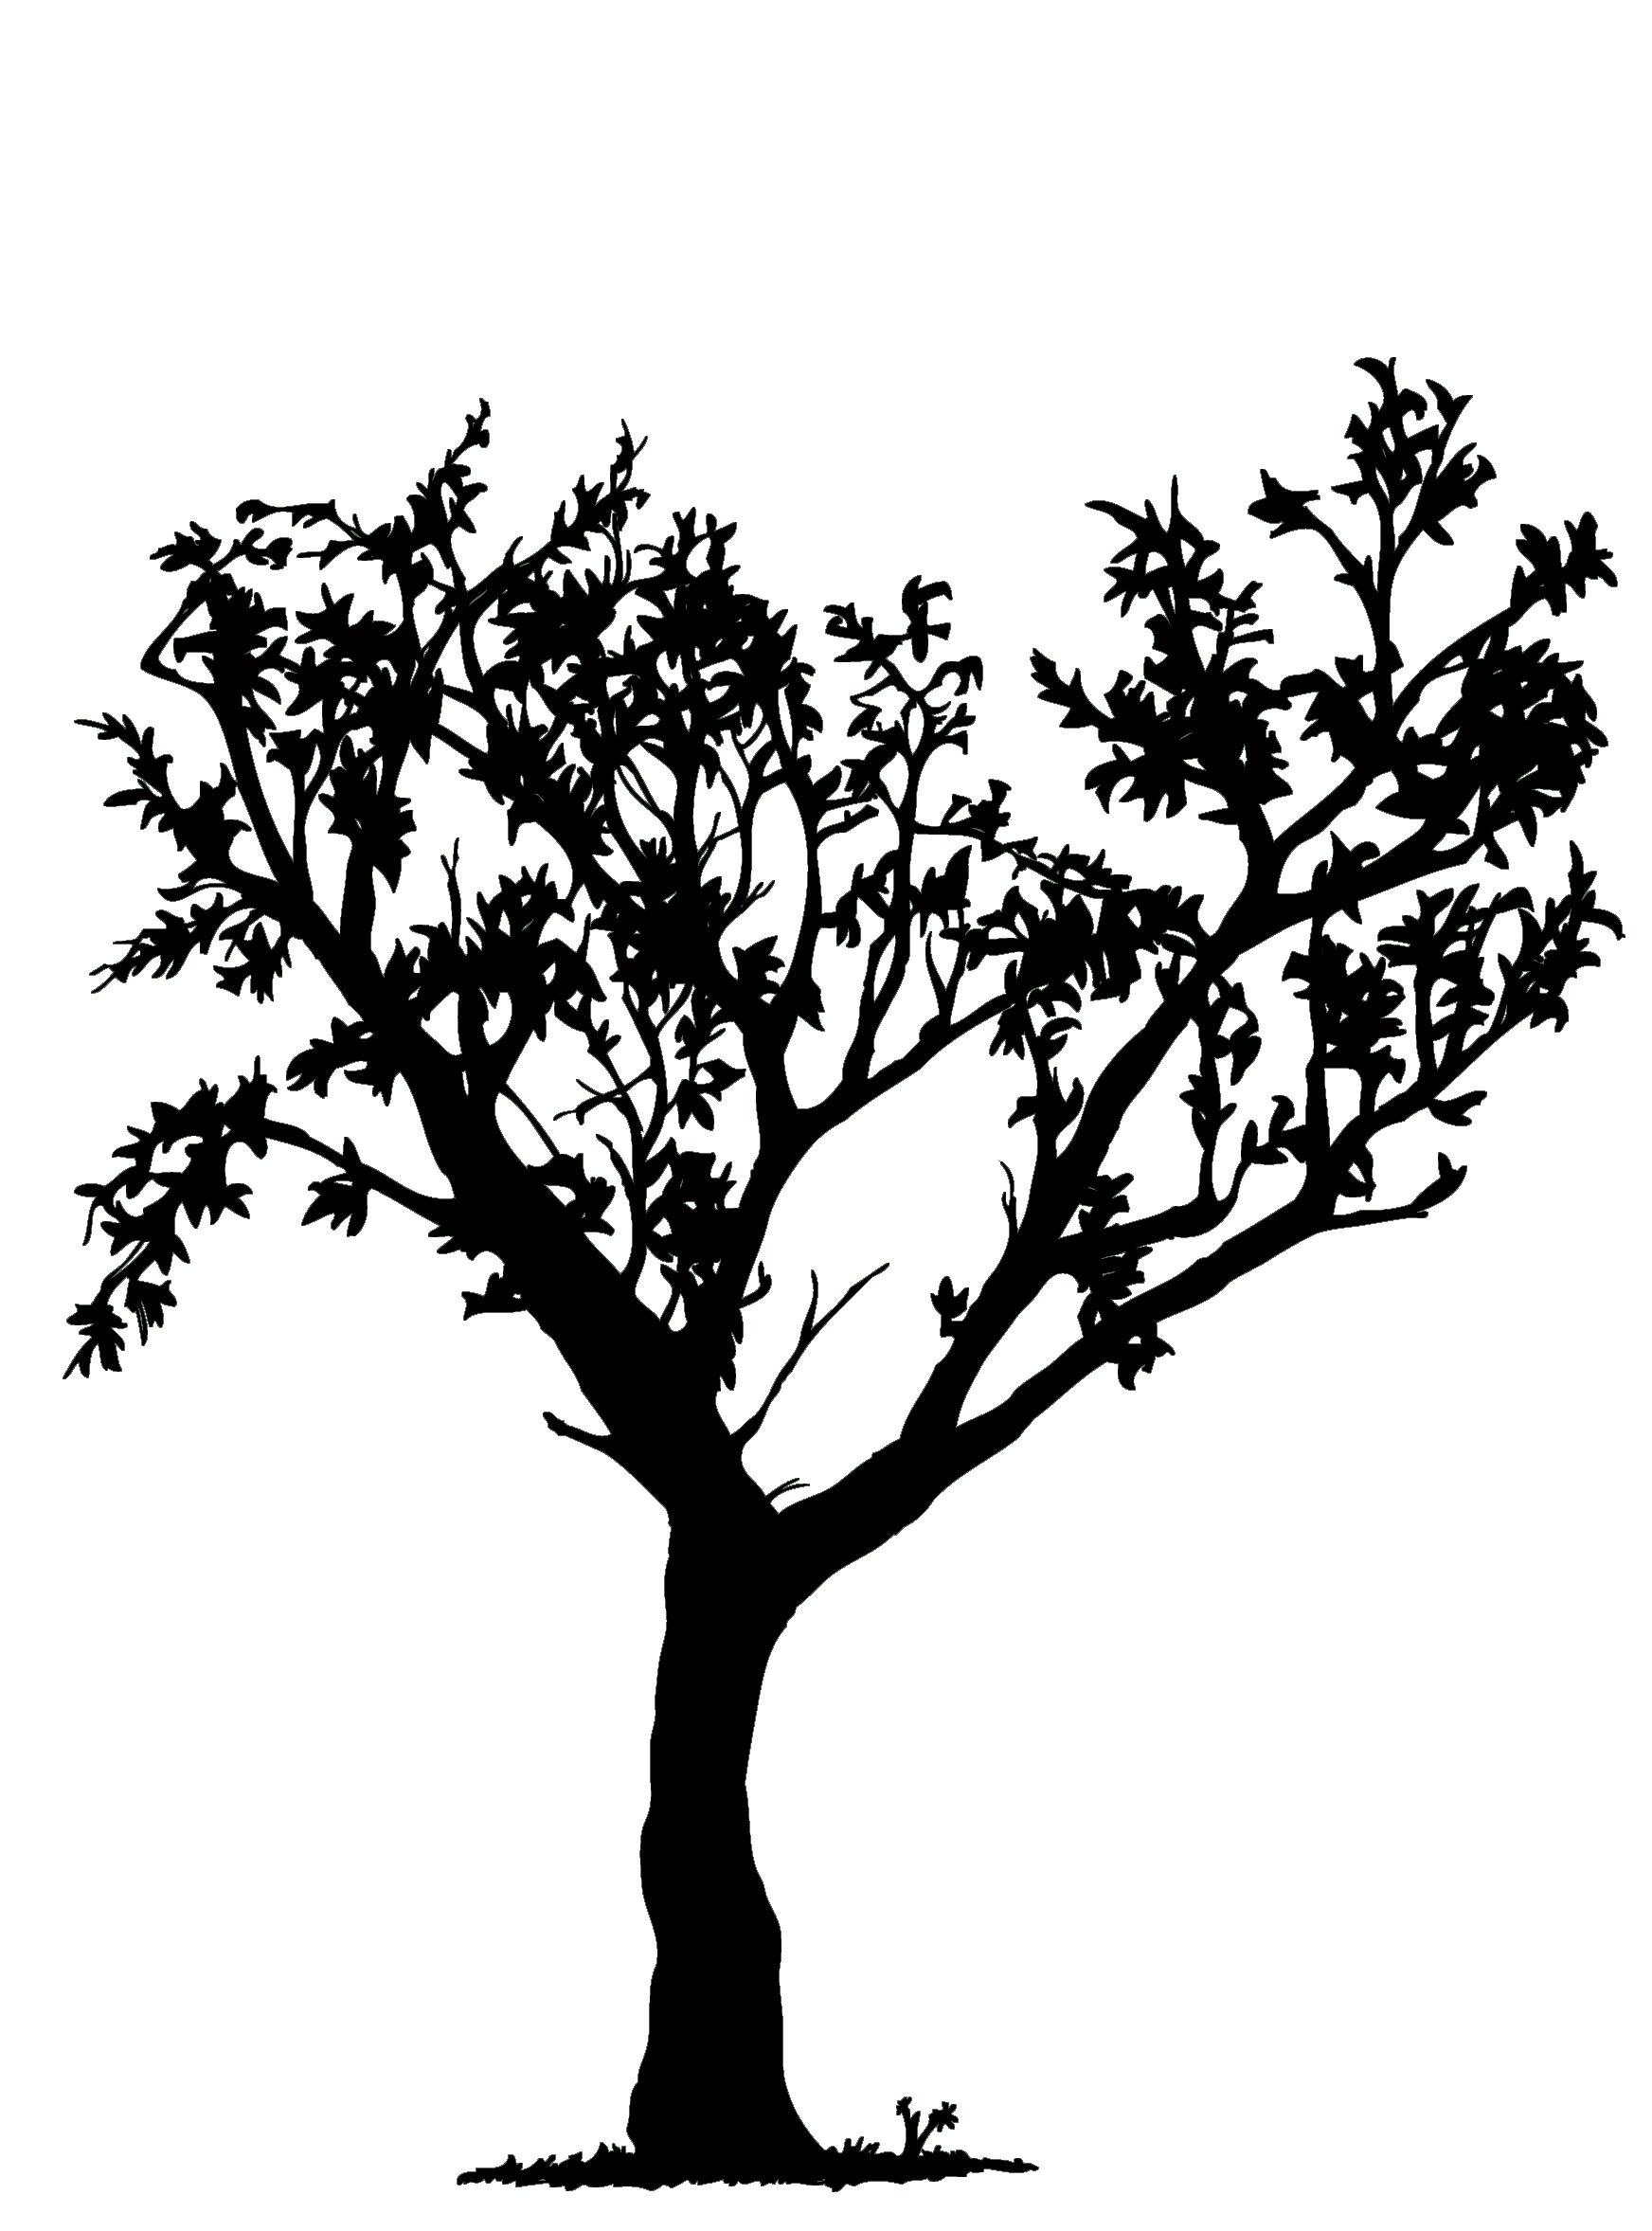 tree image black and white.